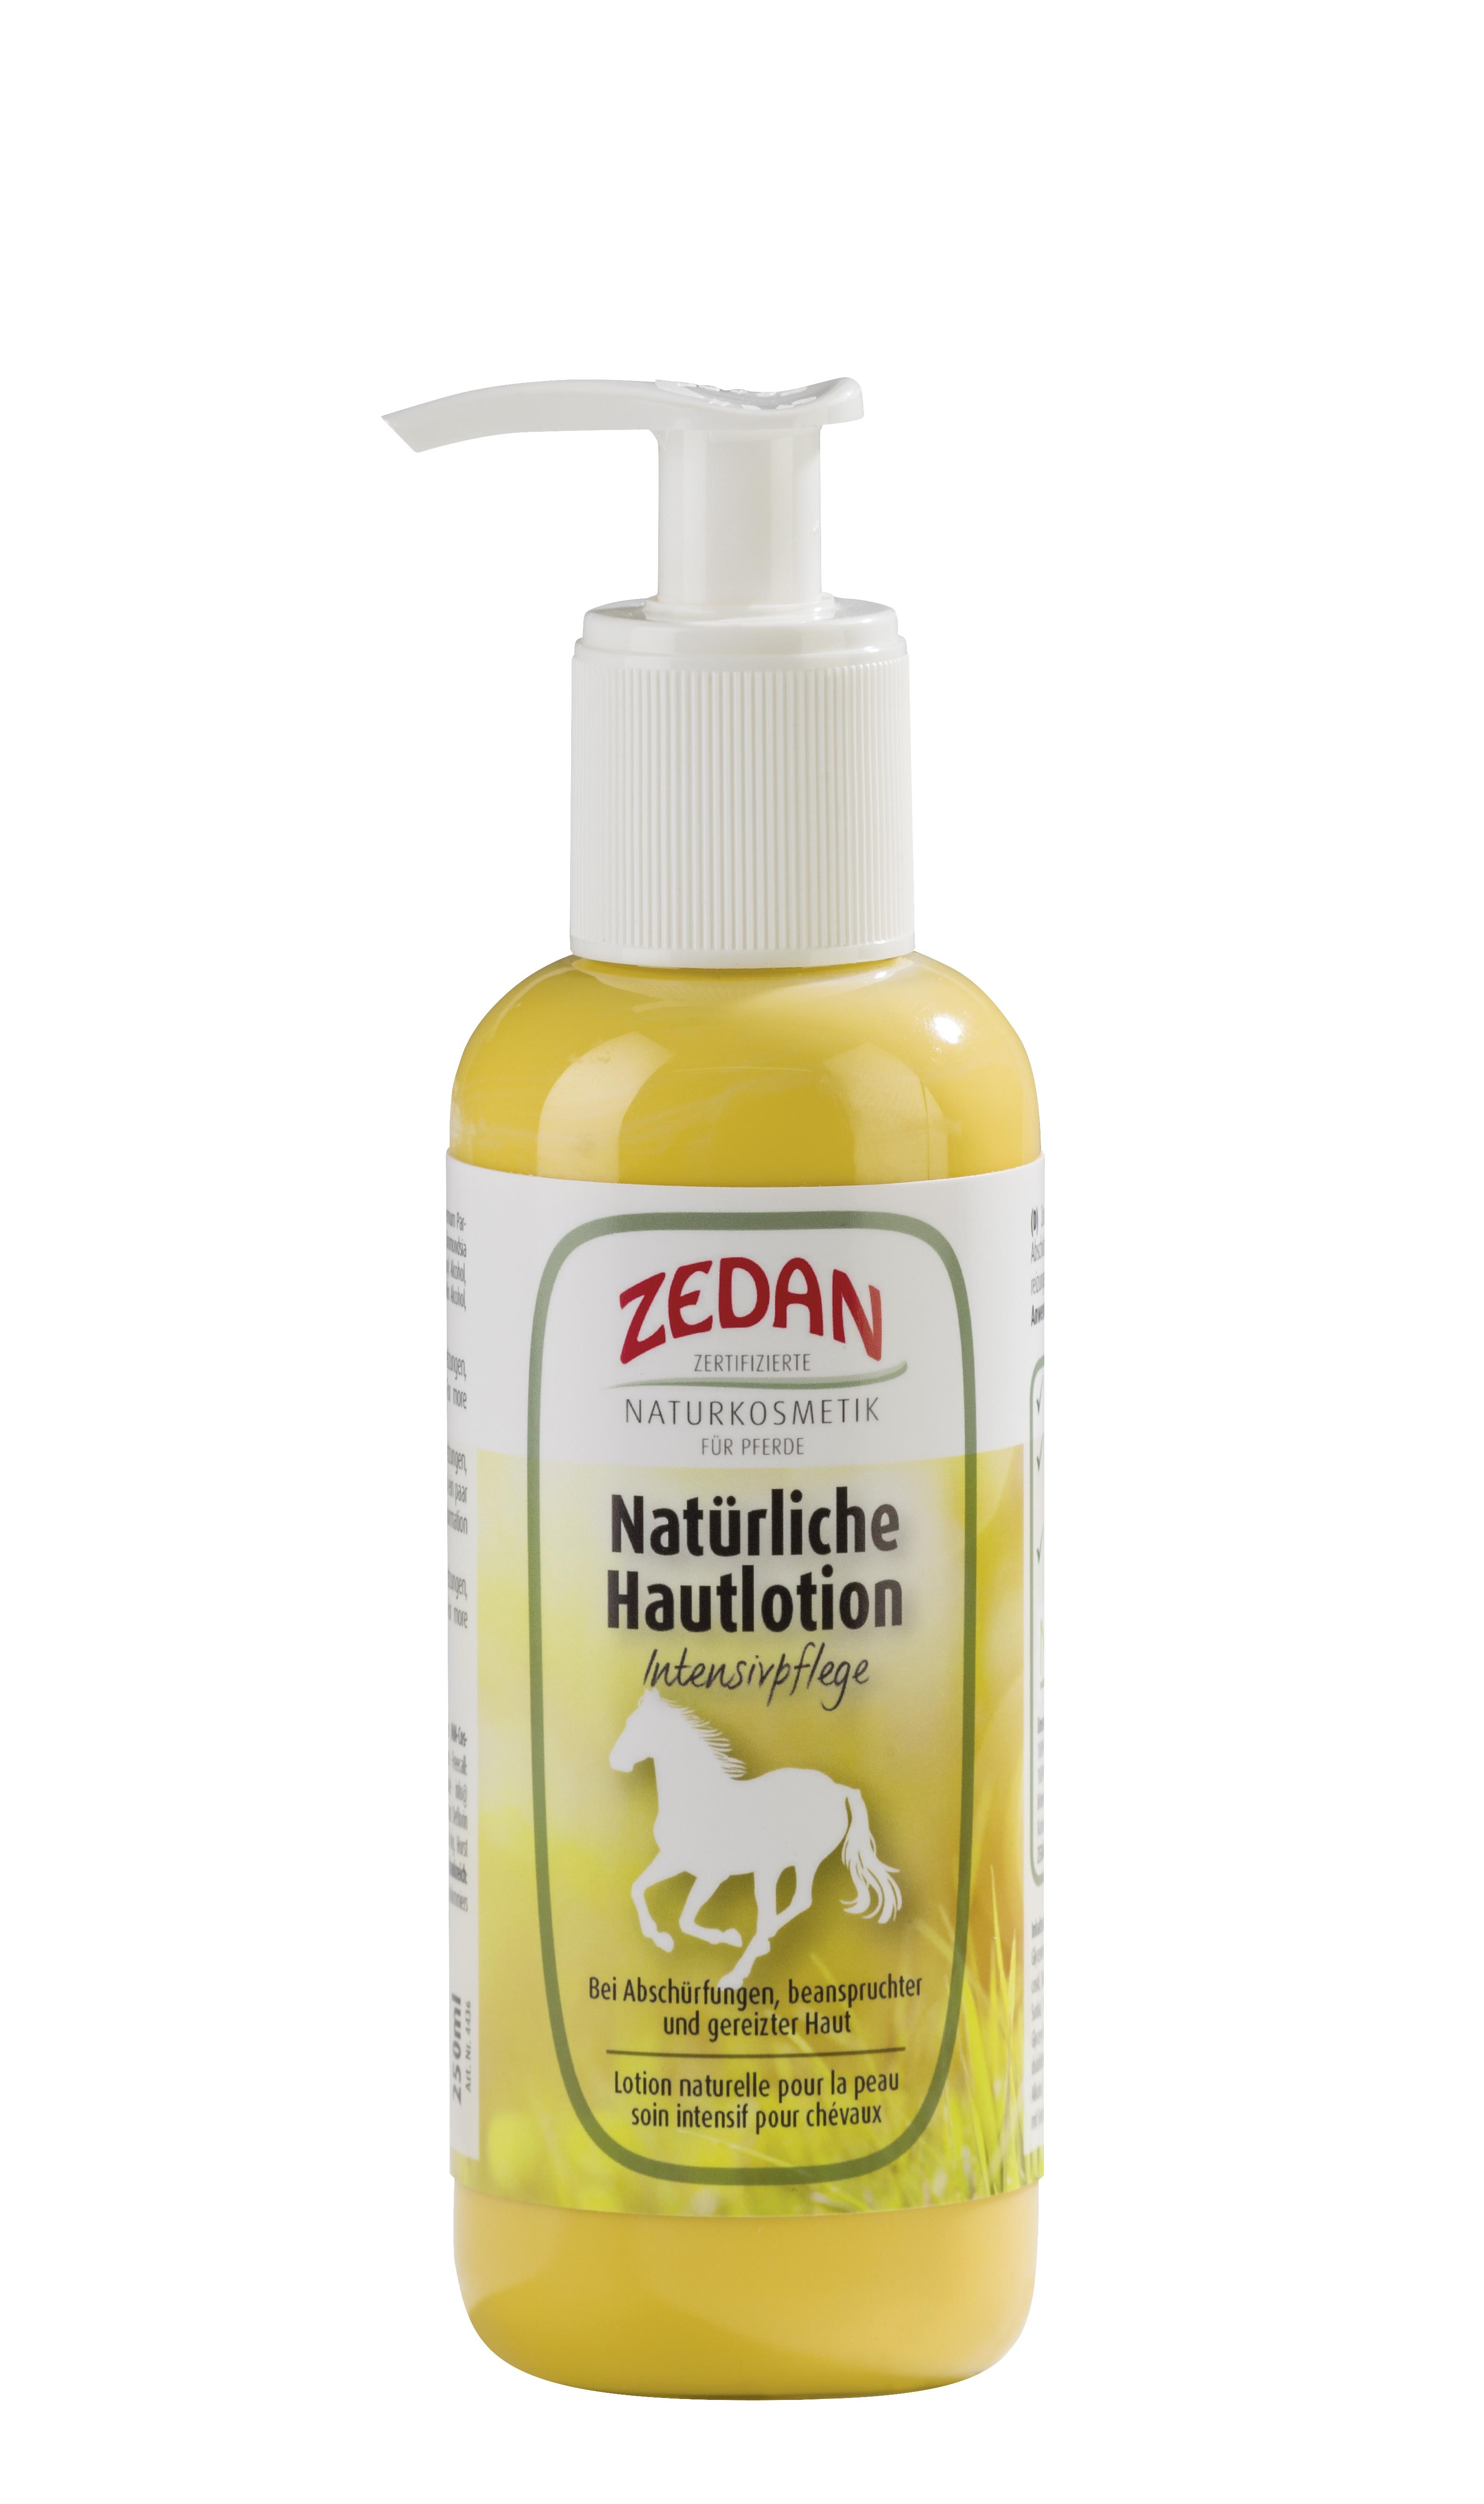 Zedan Natürliche Hautlotion 250ml